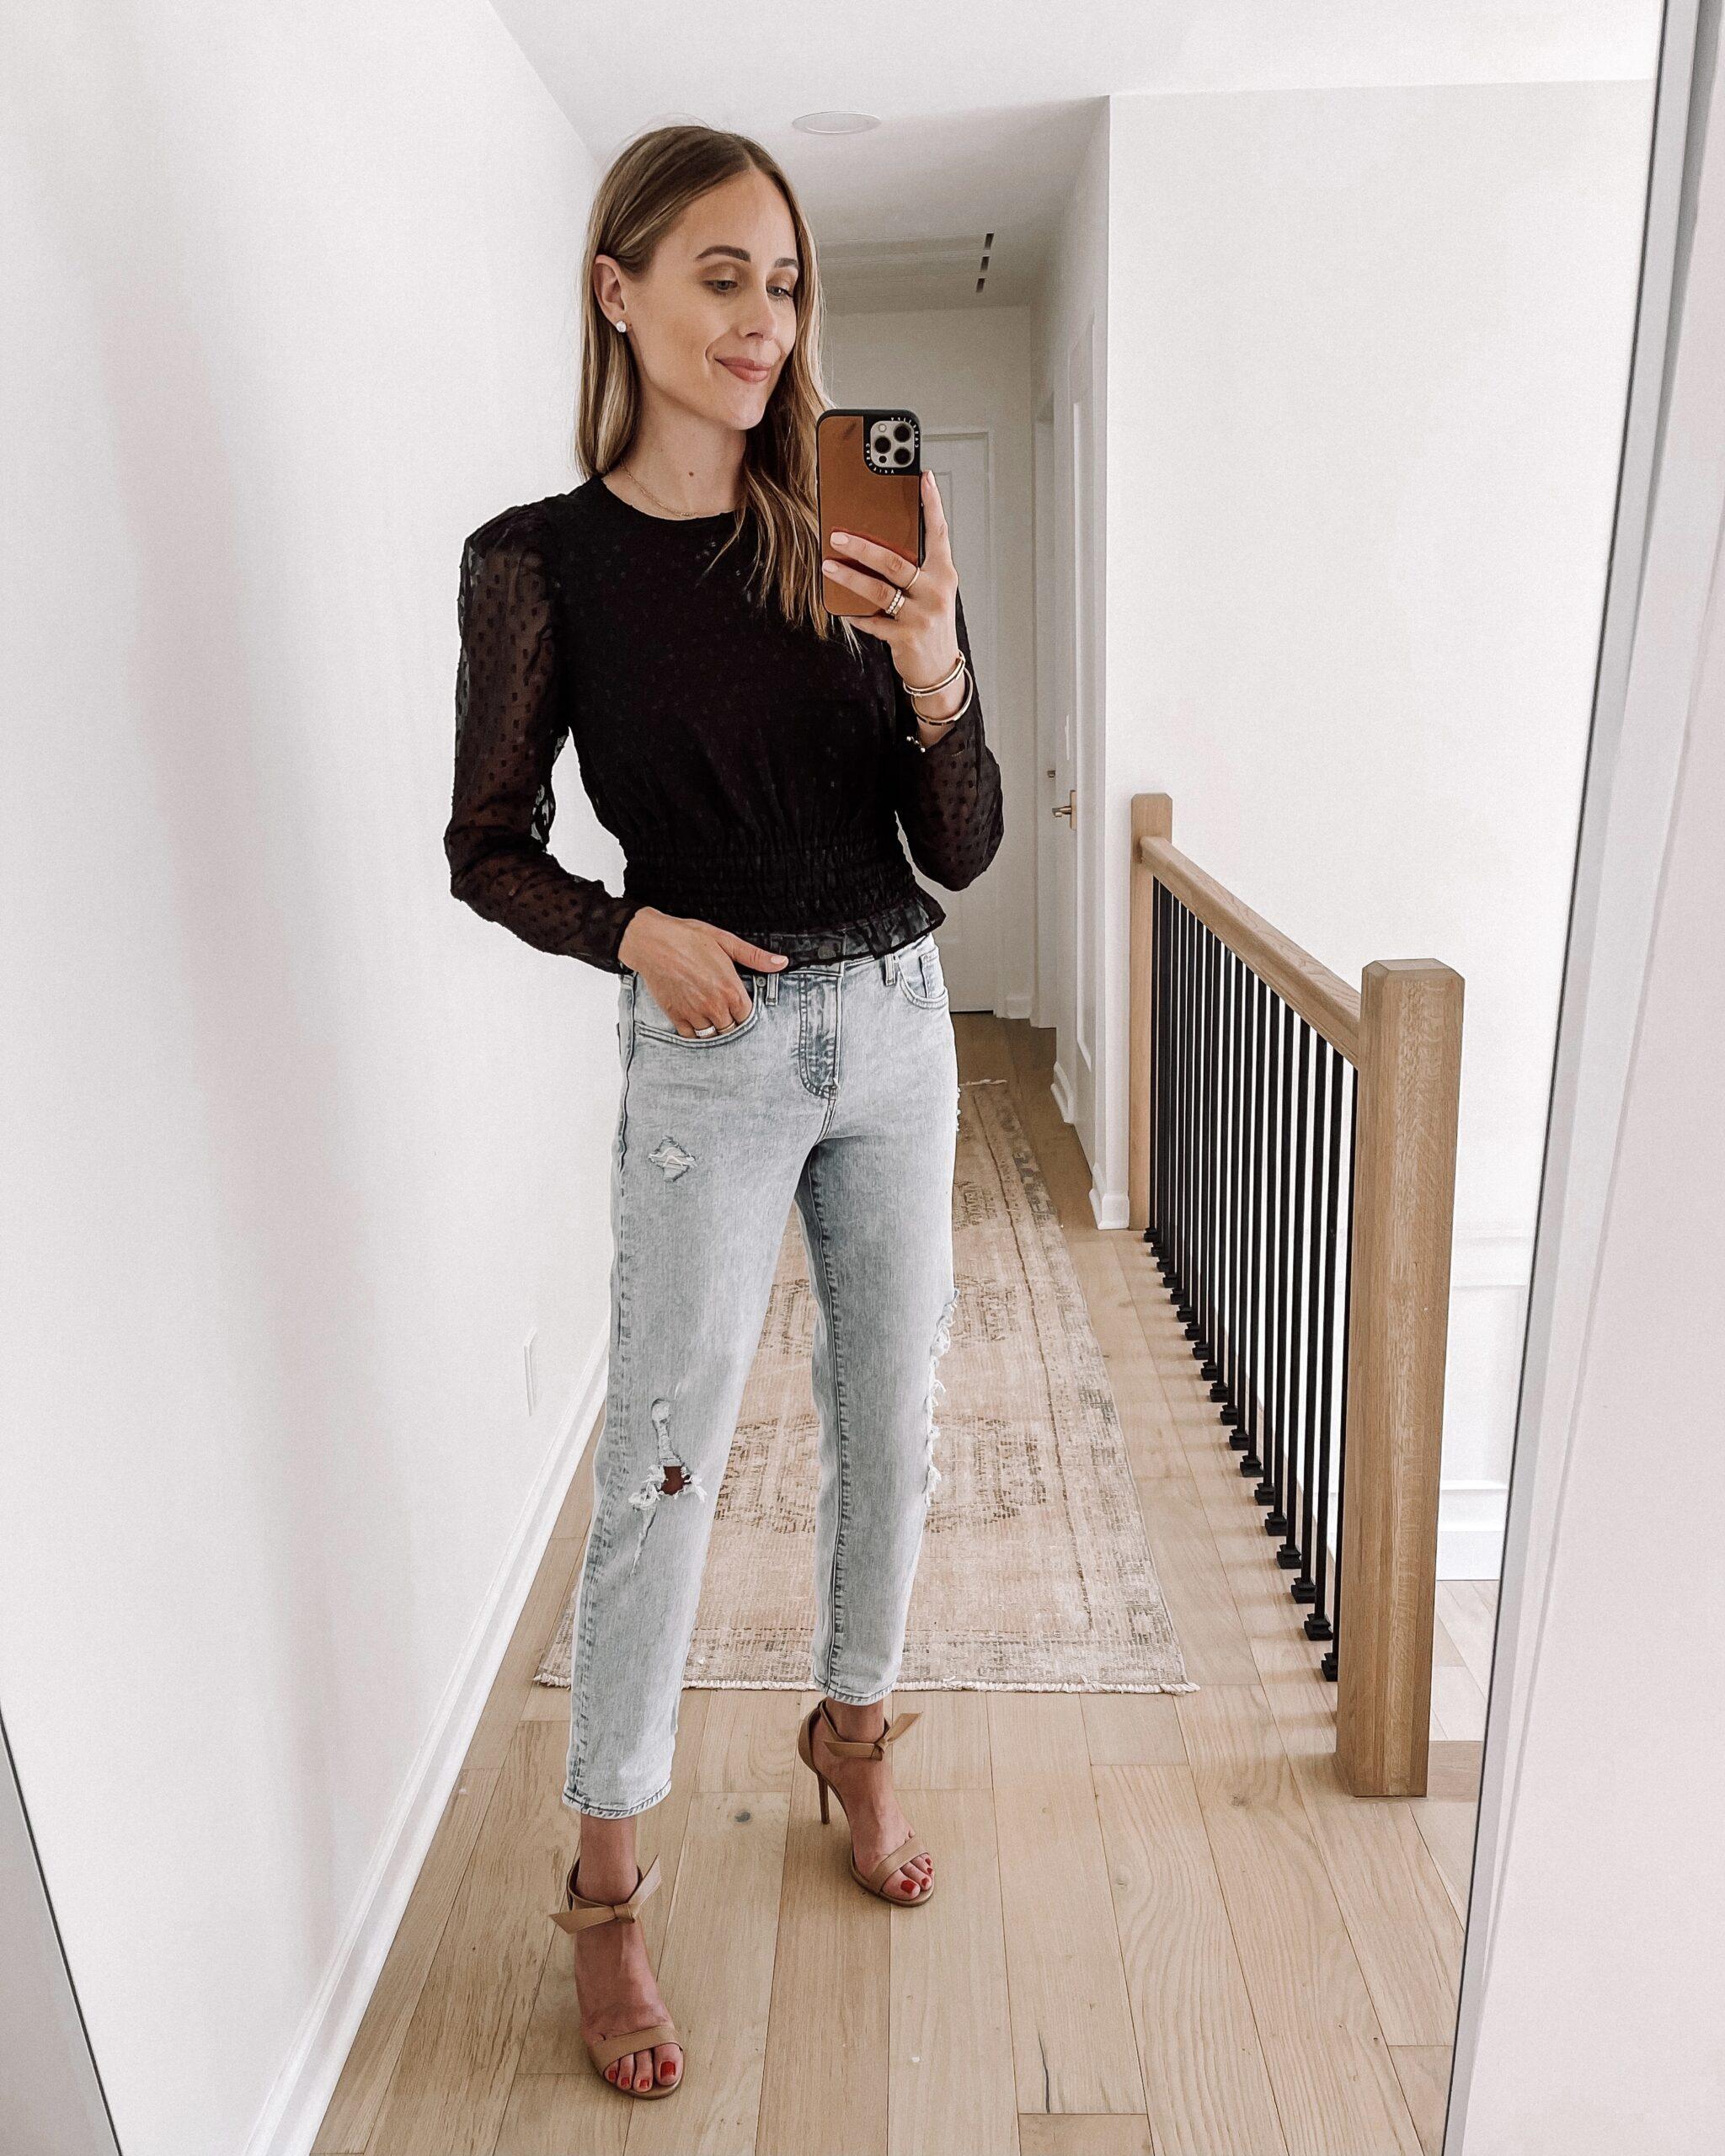 Fashion Jackson Wearing Express Distressed Boyfriend Jeans Black Long Sleeve Blouse Tan Heeled Sandals